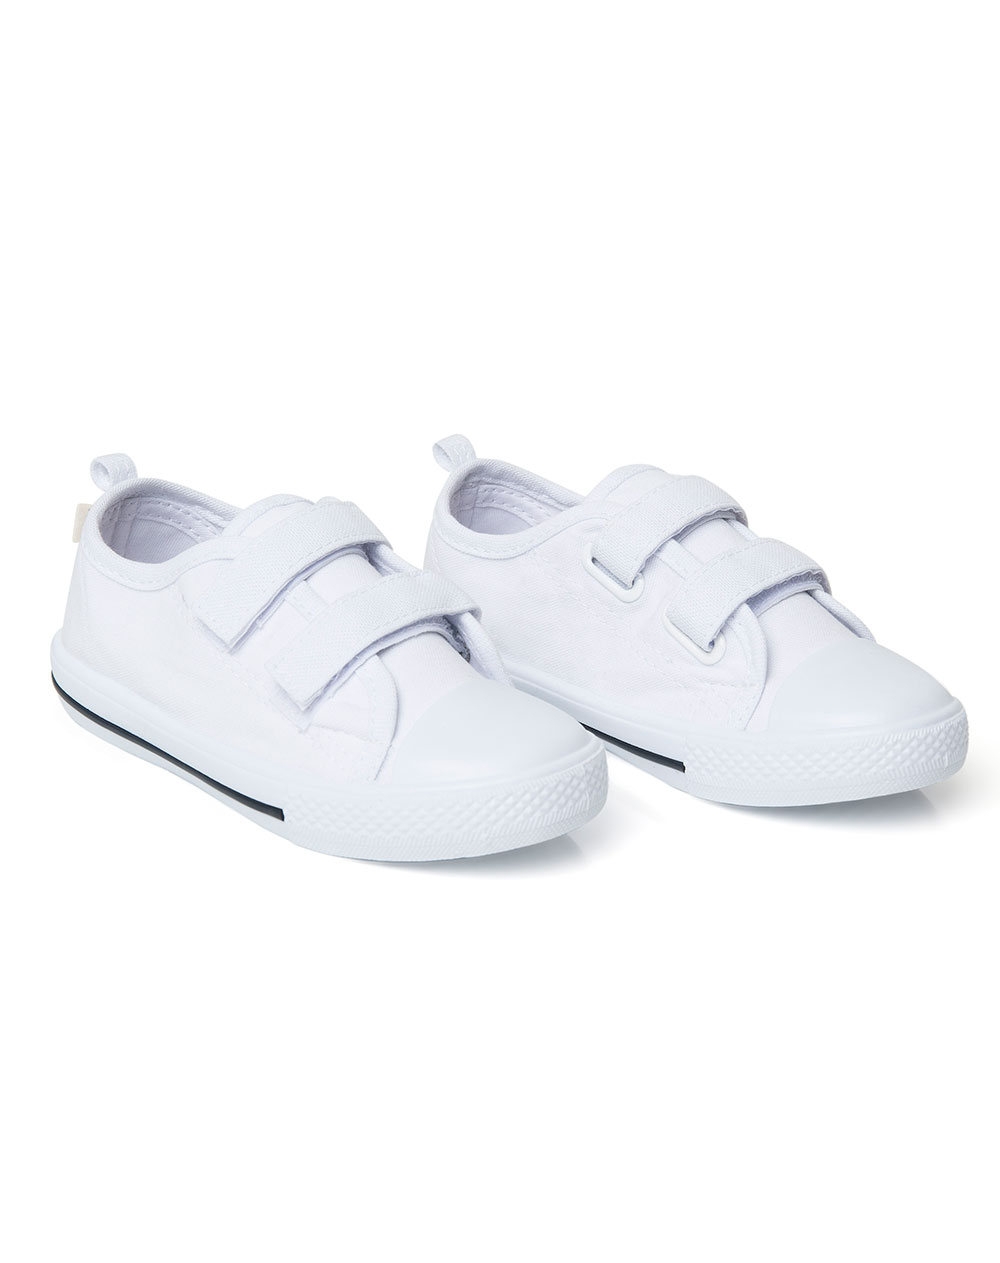 fábrica auténtica 54572 d8d0e Tenis para Bebé Niño Ditro Suela 2 Blancos Baby Fresh